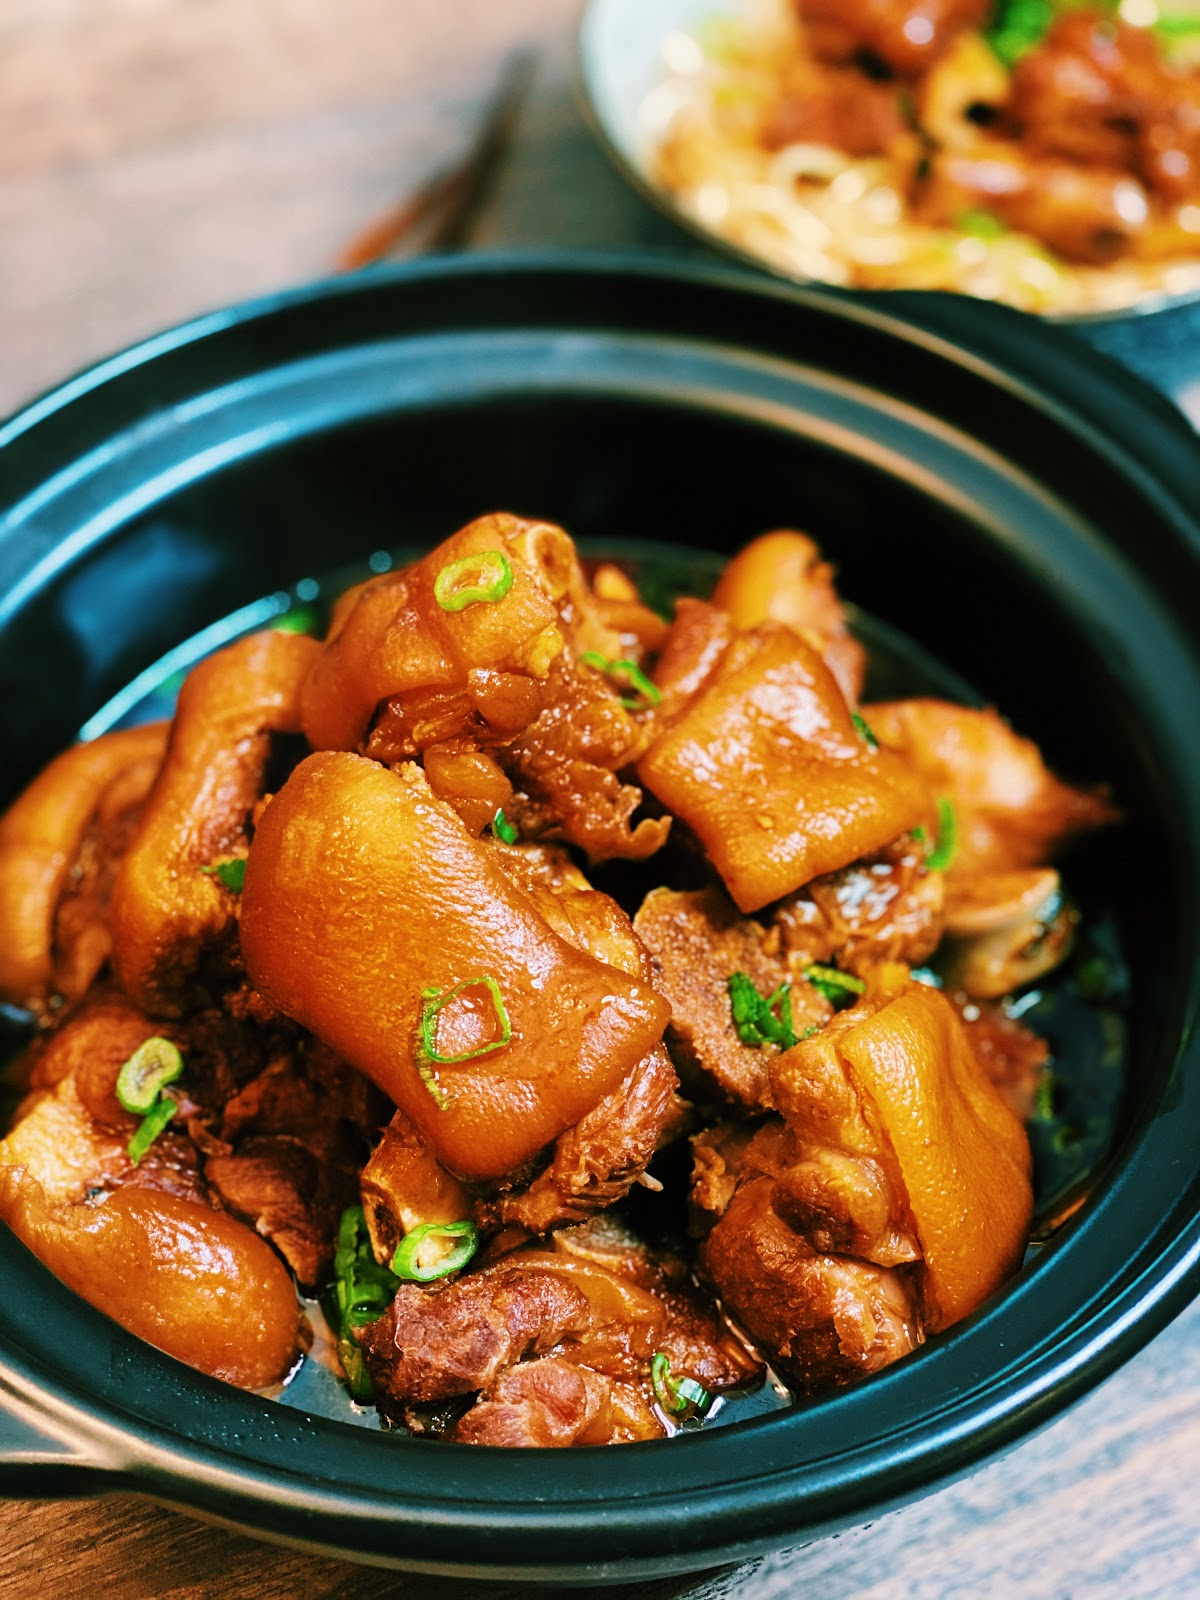 Taiwanese Braised Pork Hock